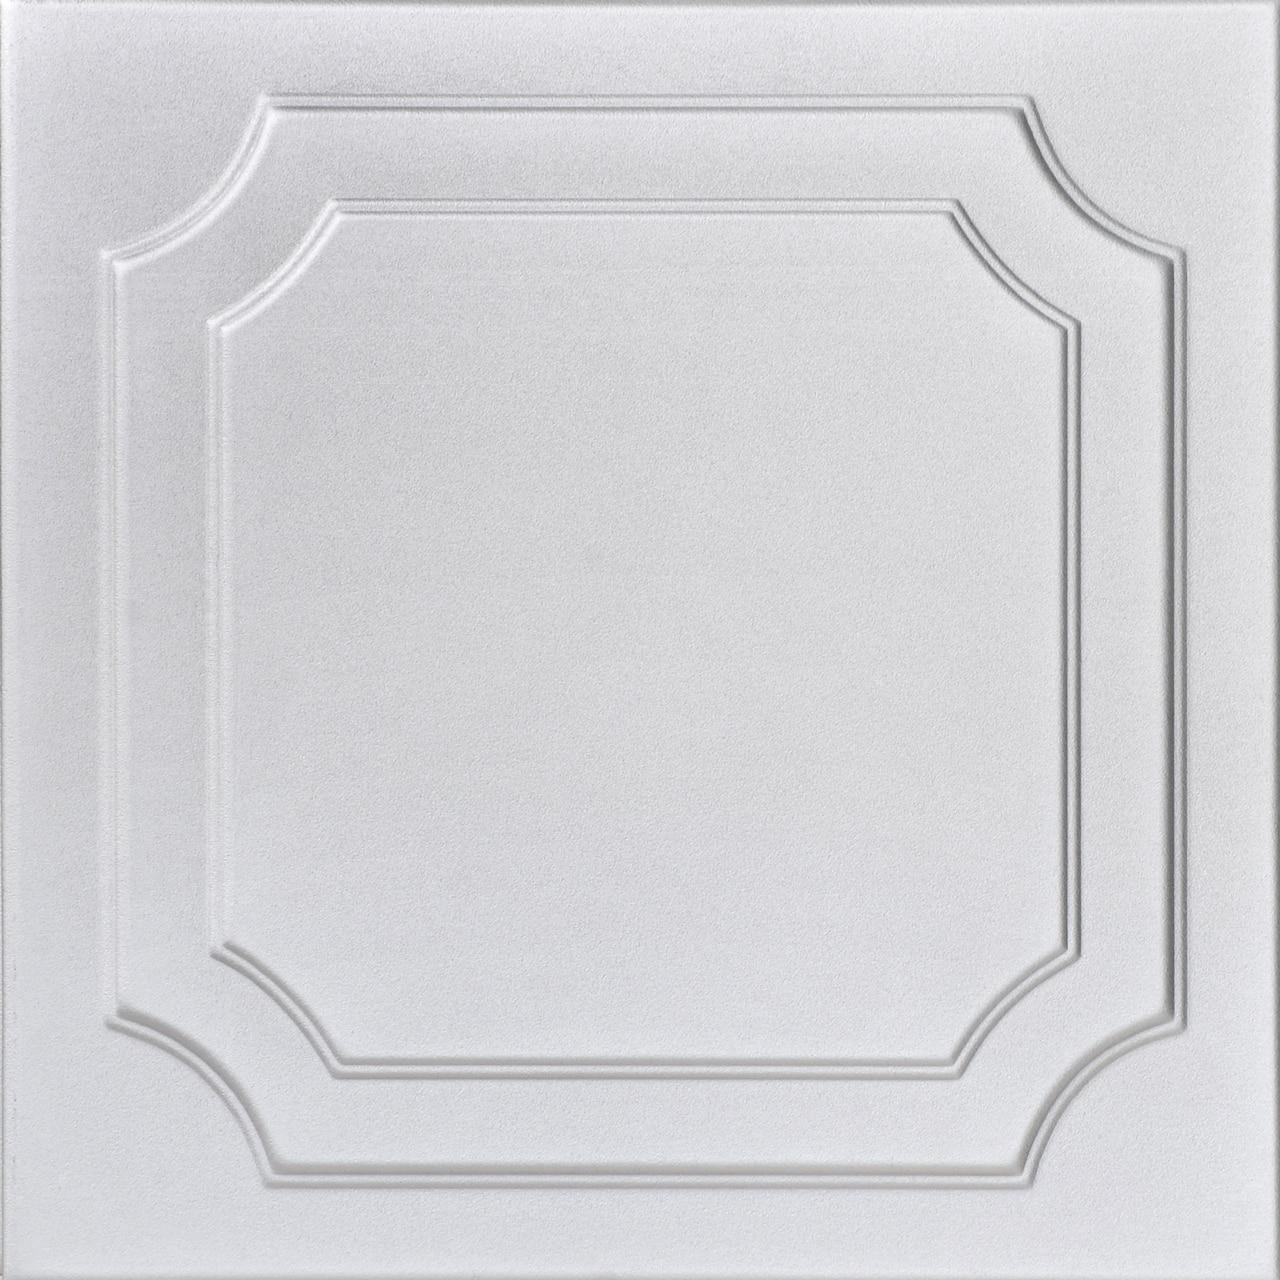 The Virginian Glue-up Styrofoam Ceiling Tile 20 in x 20 in - #R08